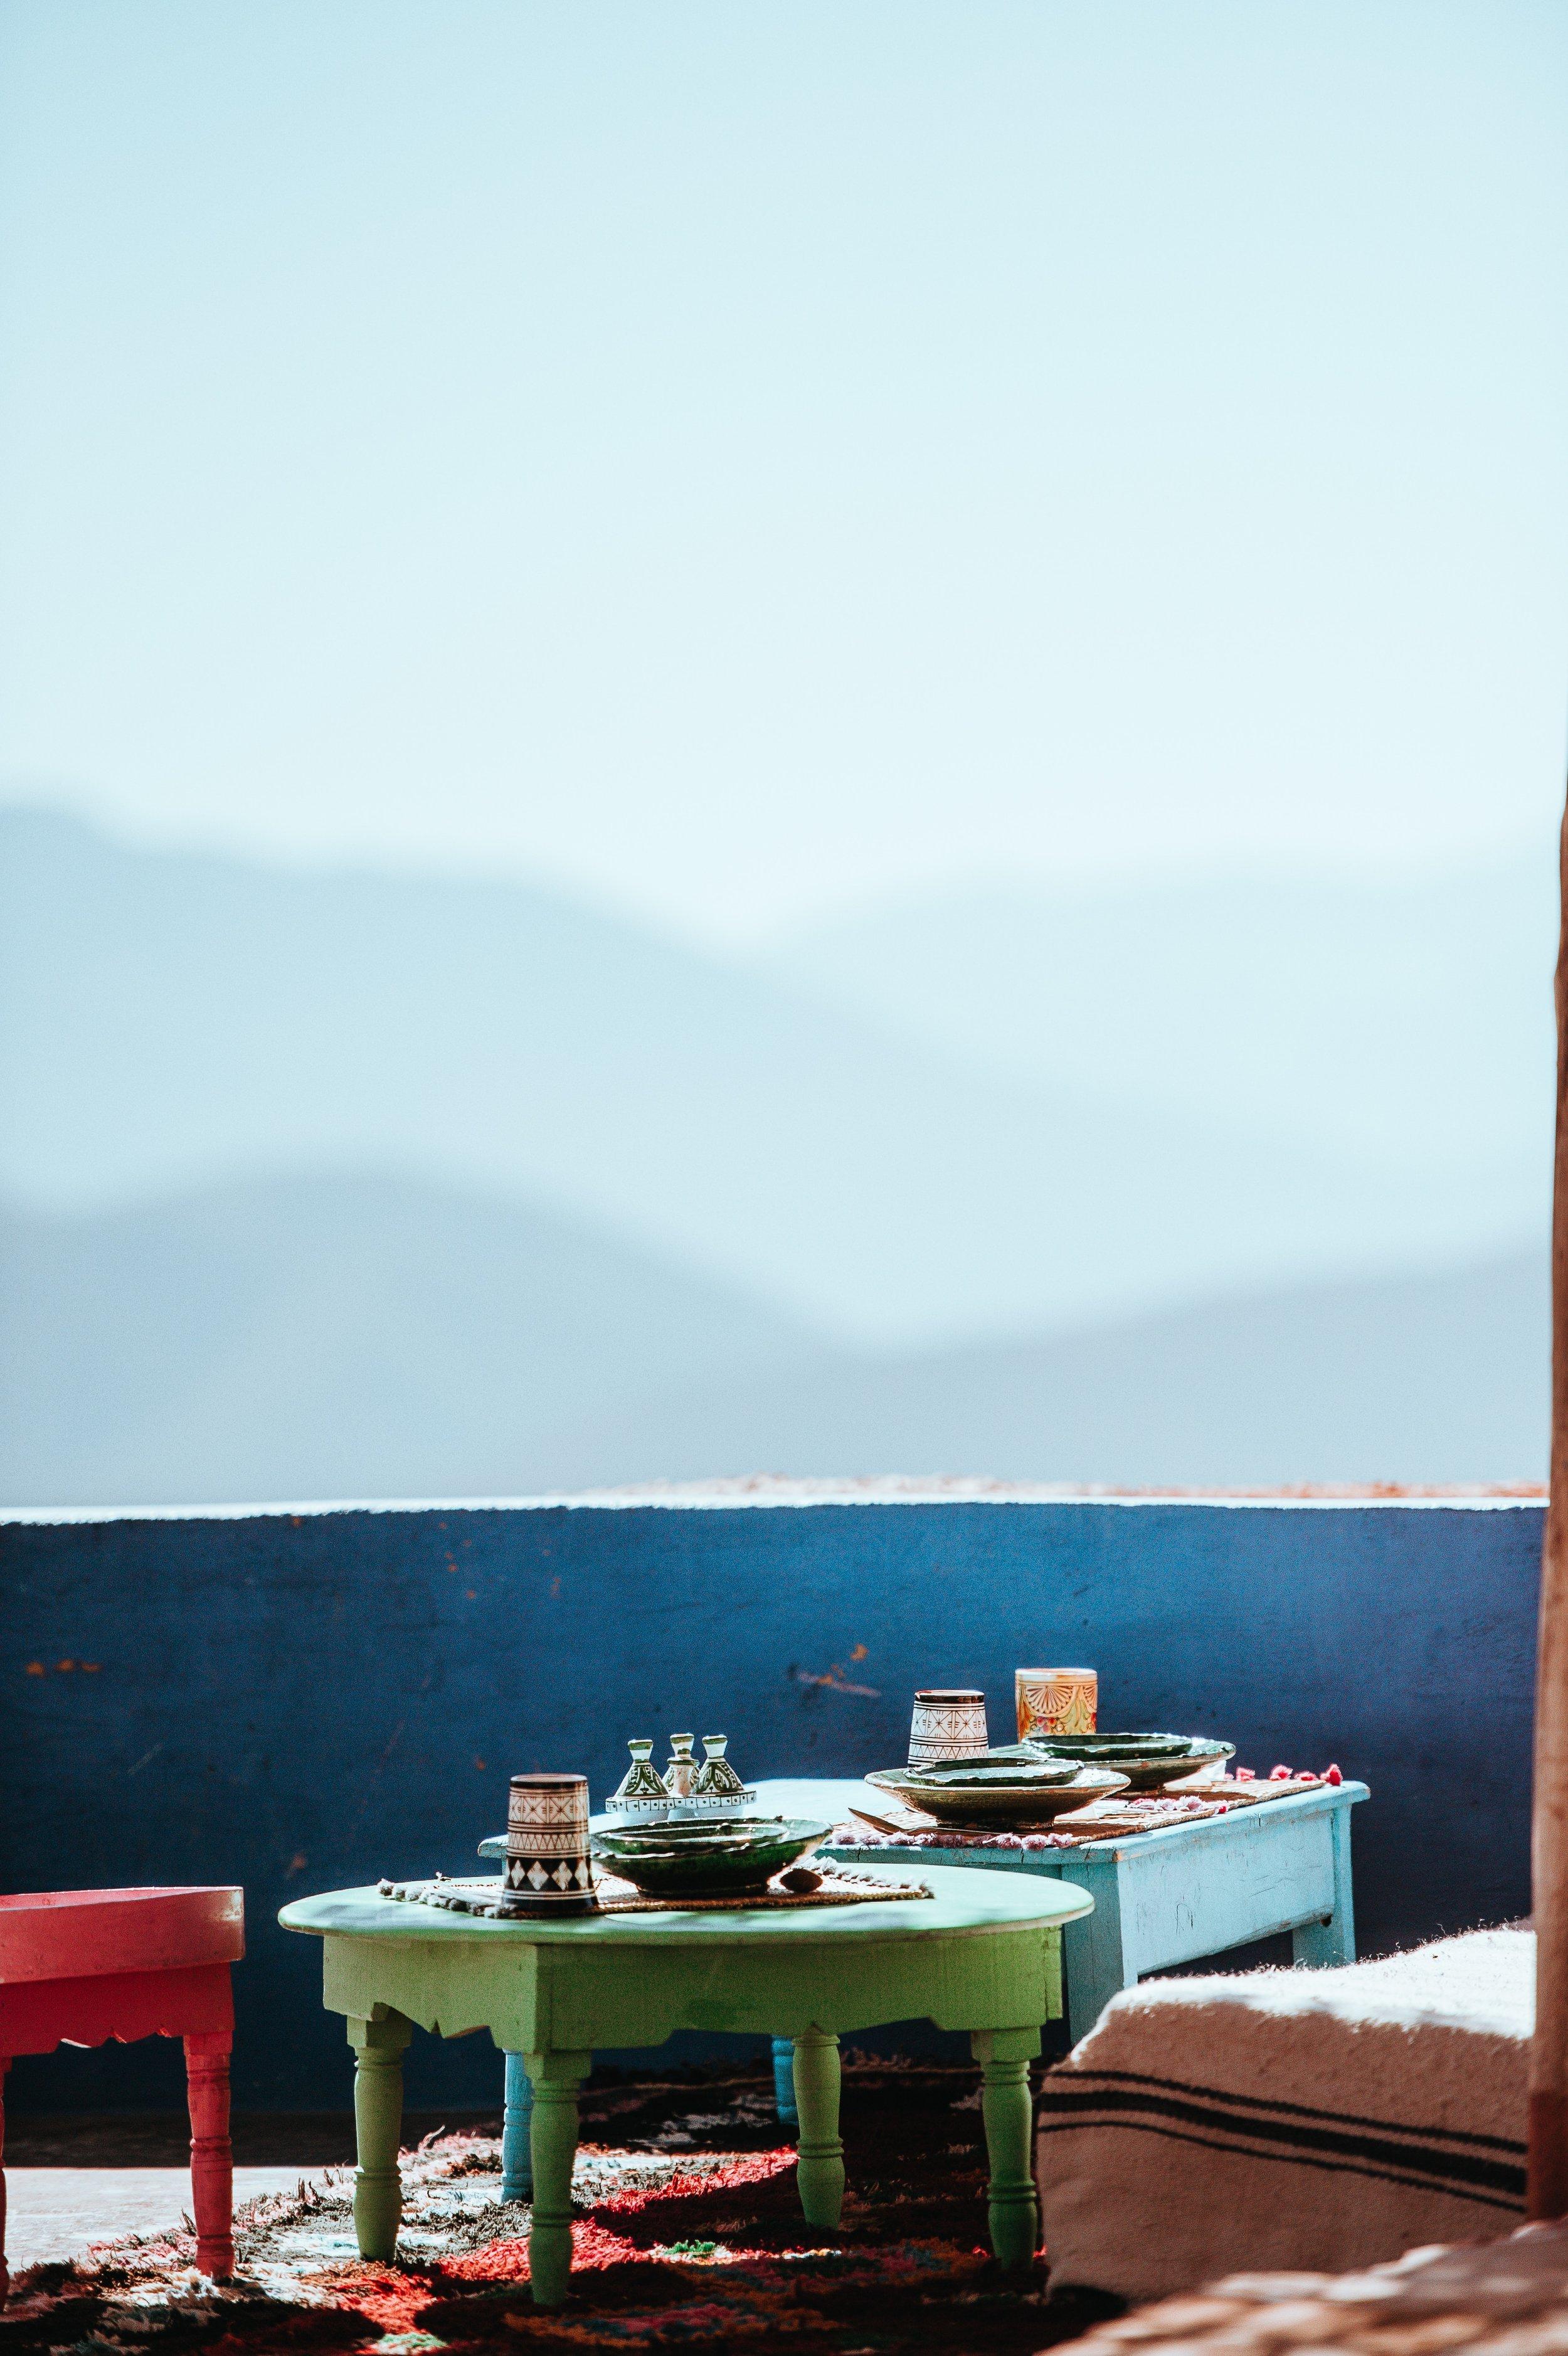 Moroccan dining annie-spratt-538516-unsplash.jpg